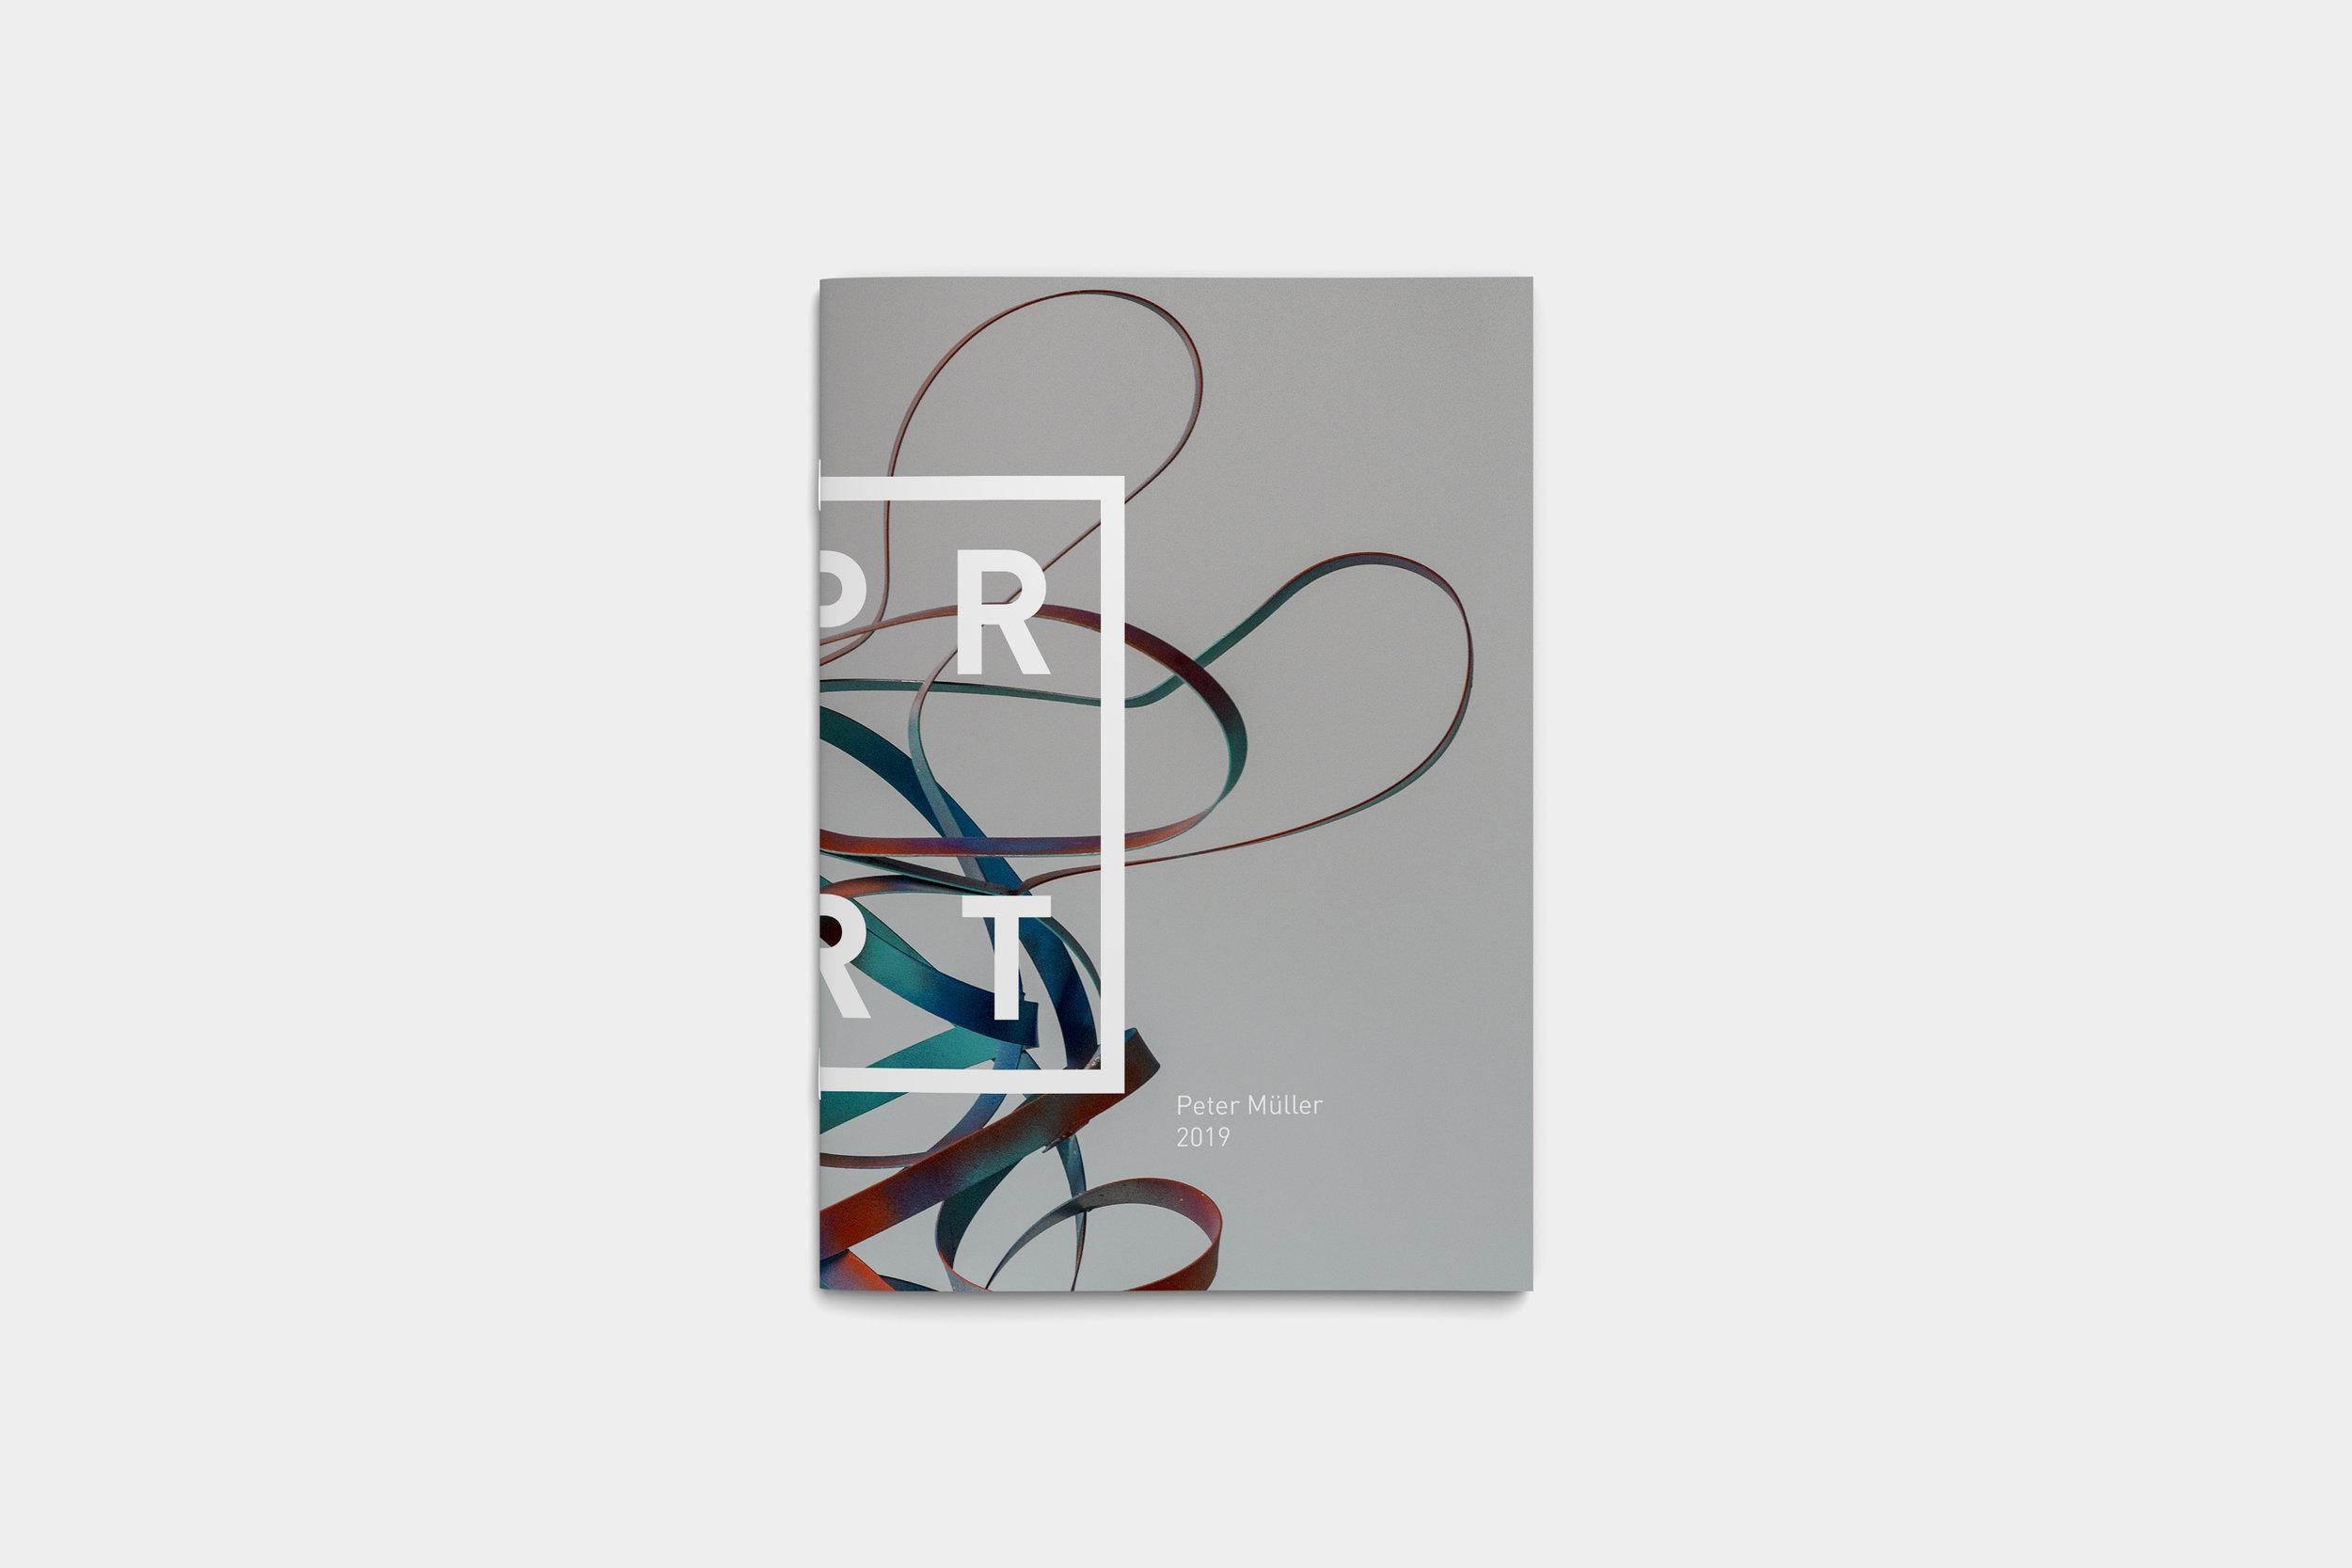 blank-rpr-art-catalog-peter-mueller-1.jpg